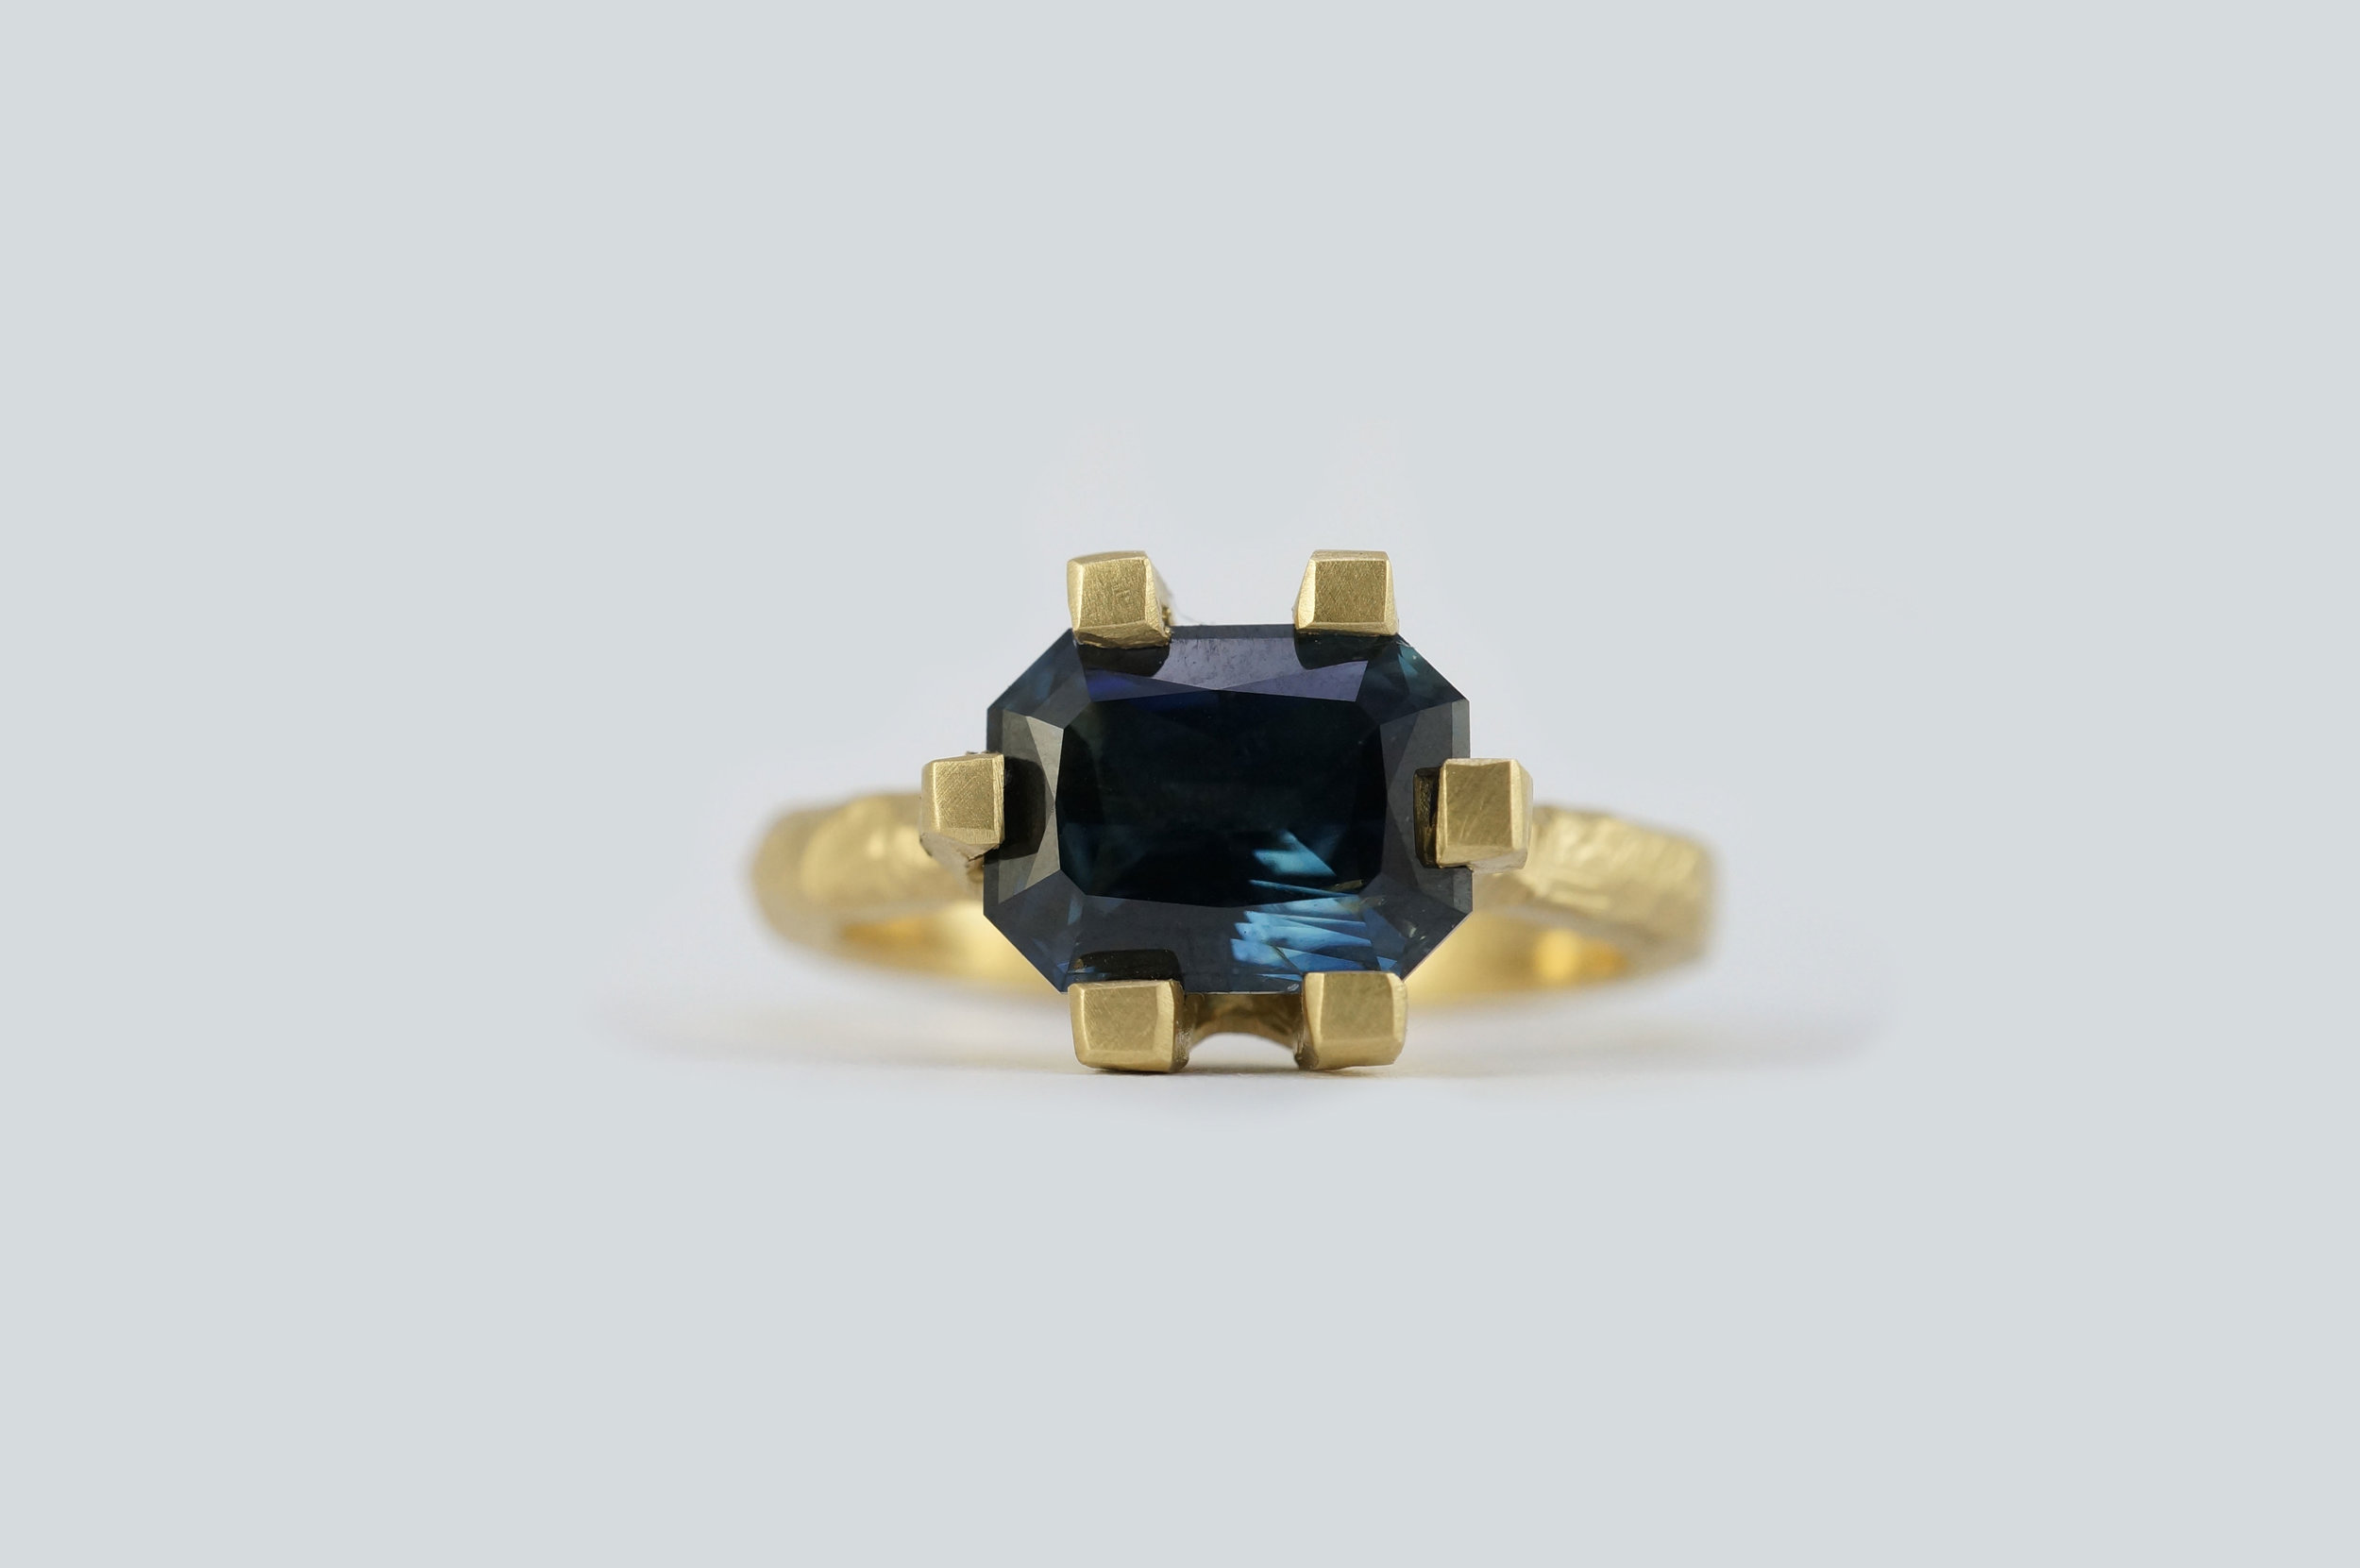 Emerald-cut-sapphire-18ct-gold5.jpg